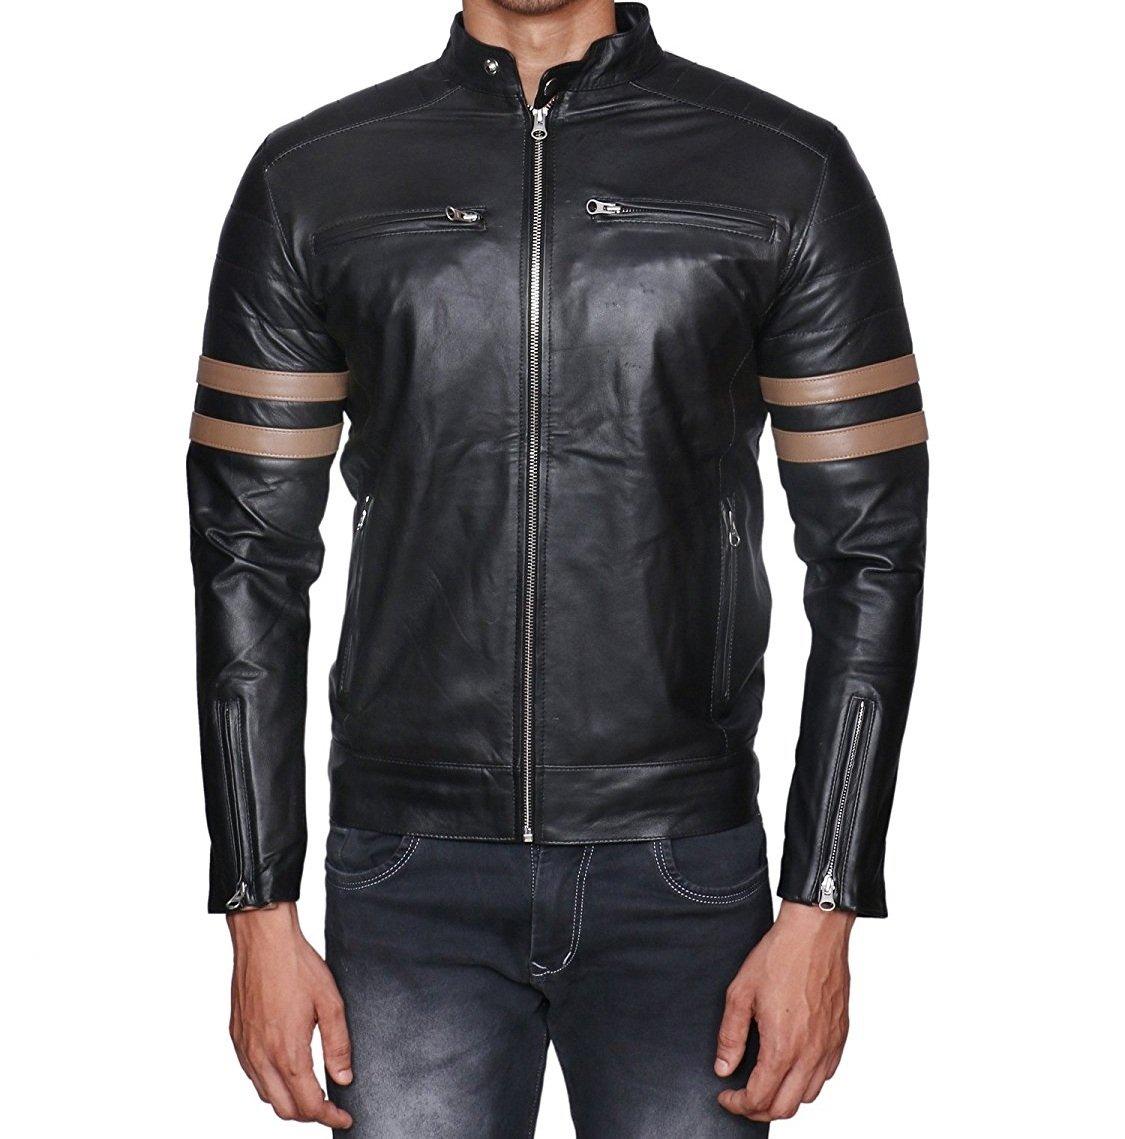 HI CLASS LEATHER Men's Lambskin Leather Jacket Large Black